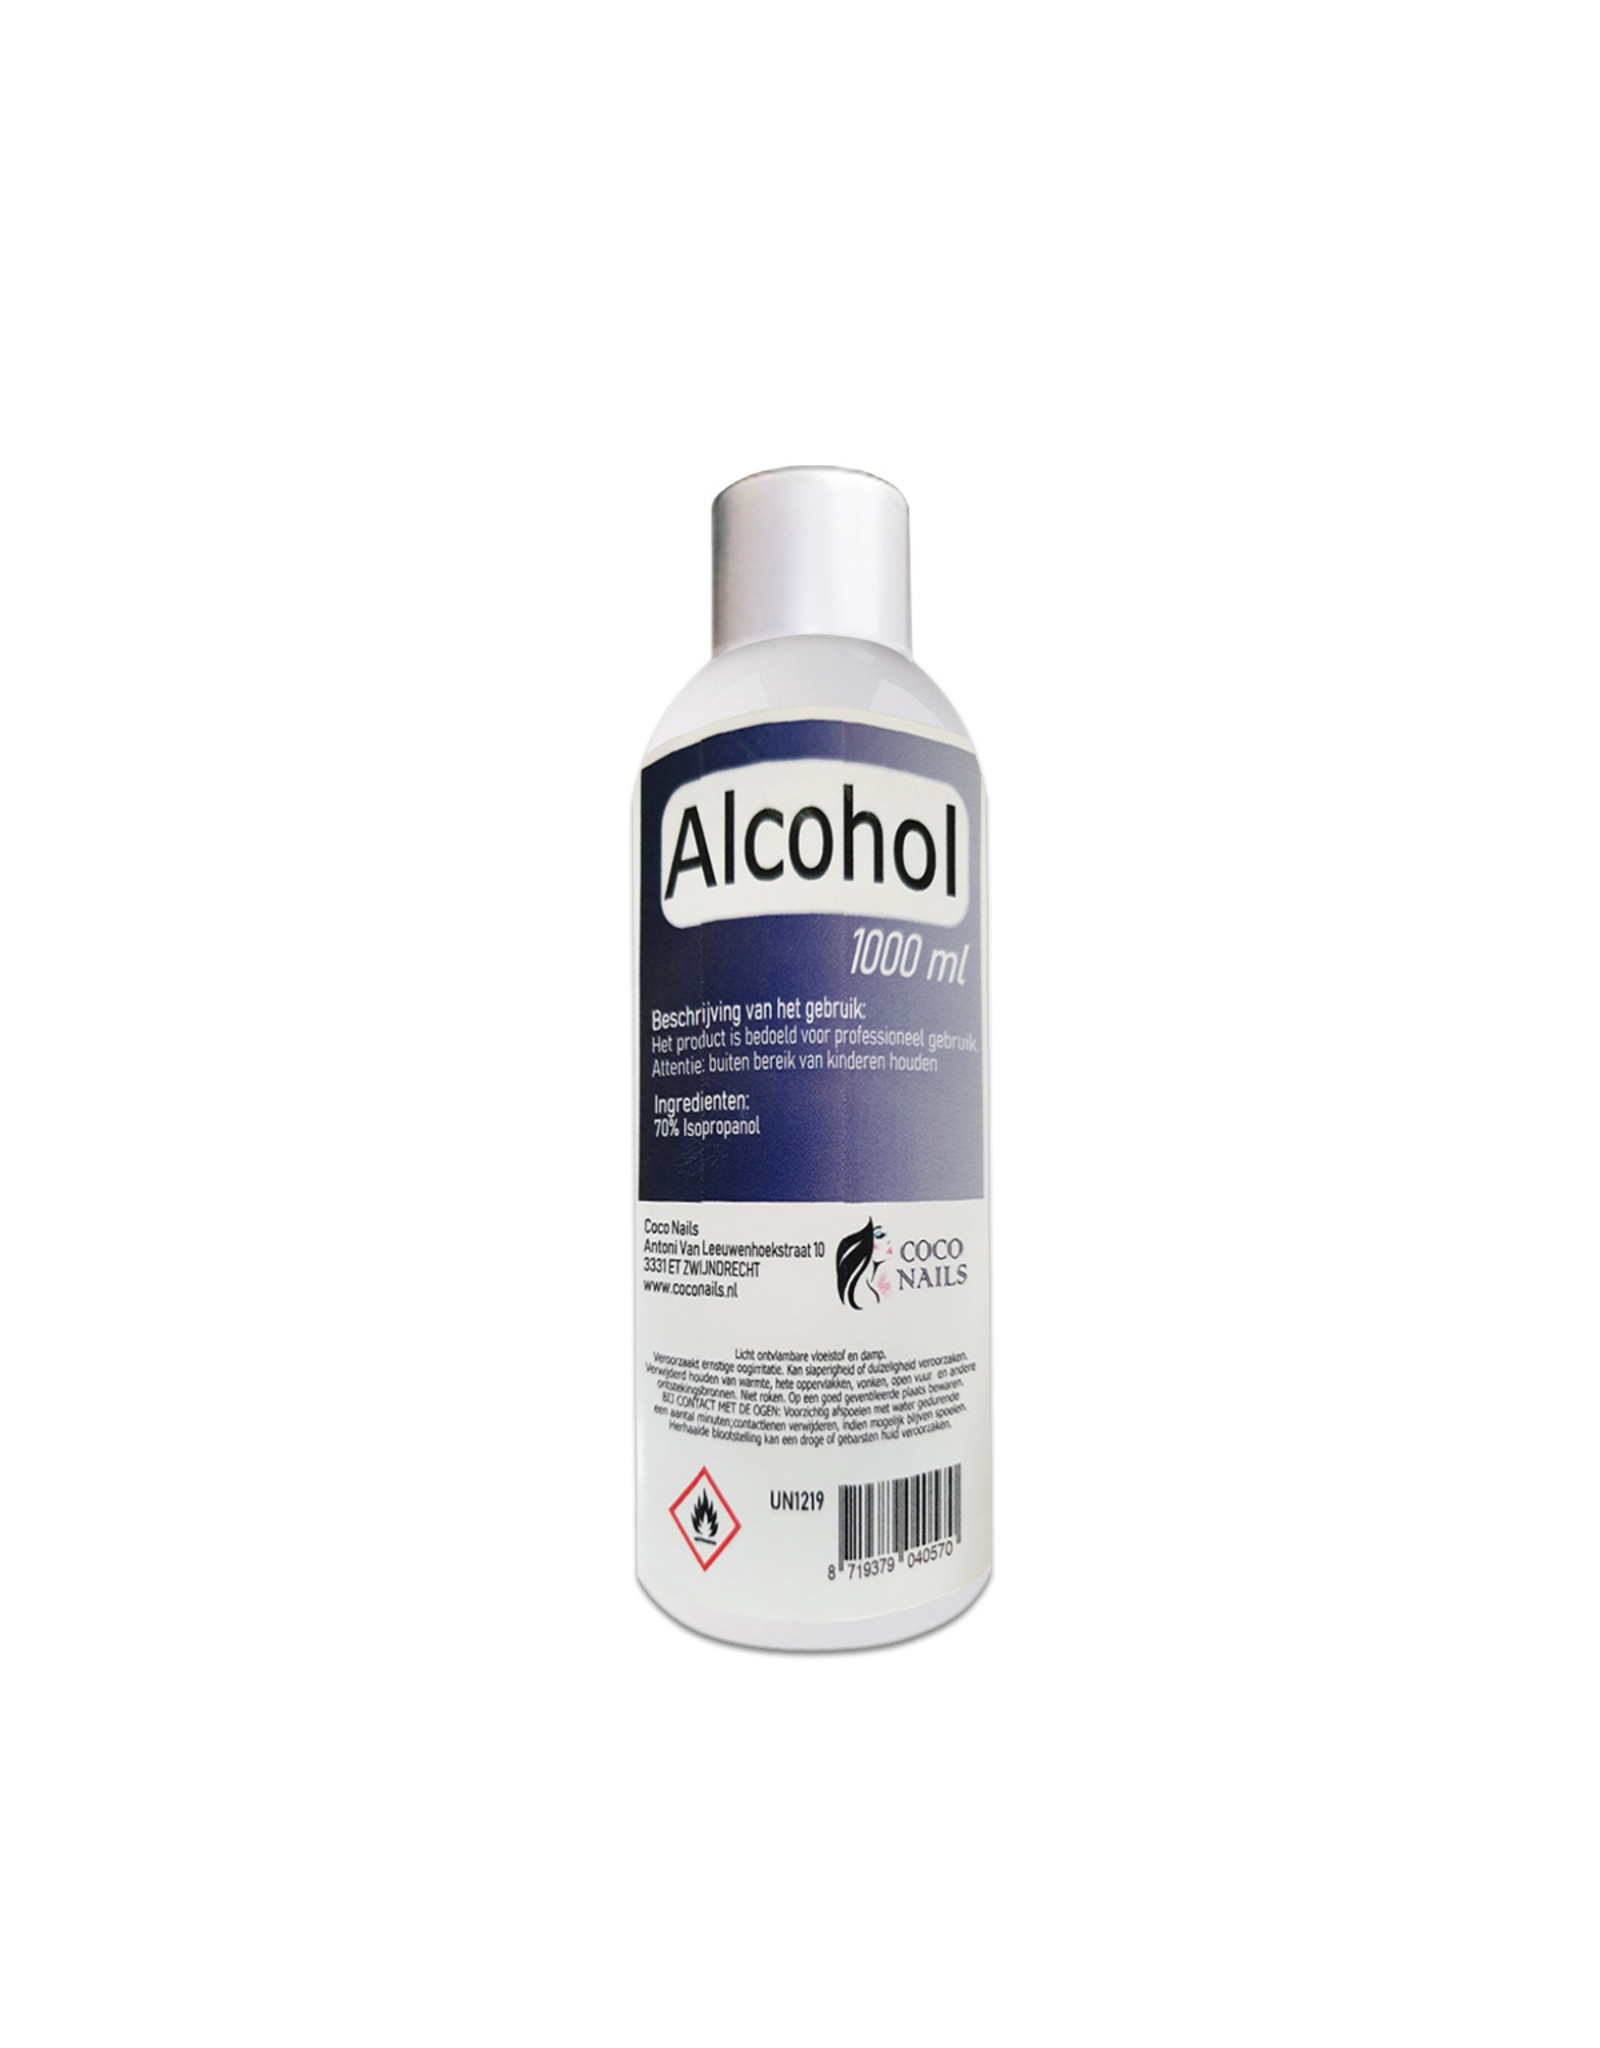 Coconails Desinfectiemiddel /Alcohol  70% 1000 ml/+ 1 lege flesjes 100ml./Hand desinfectie